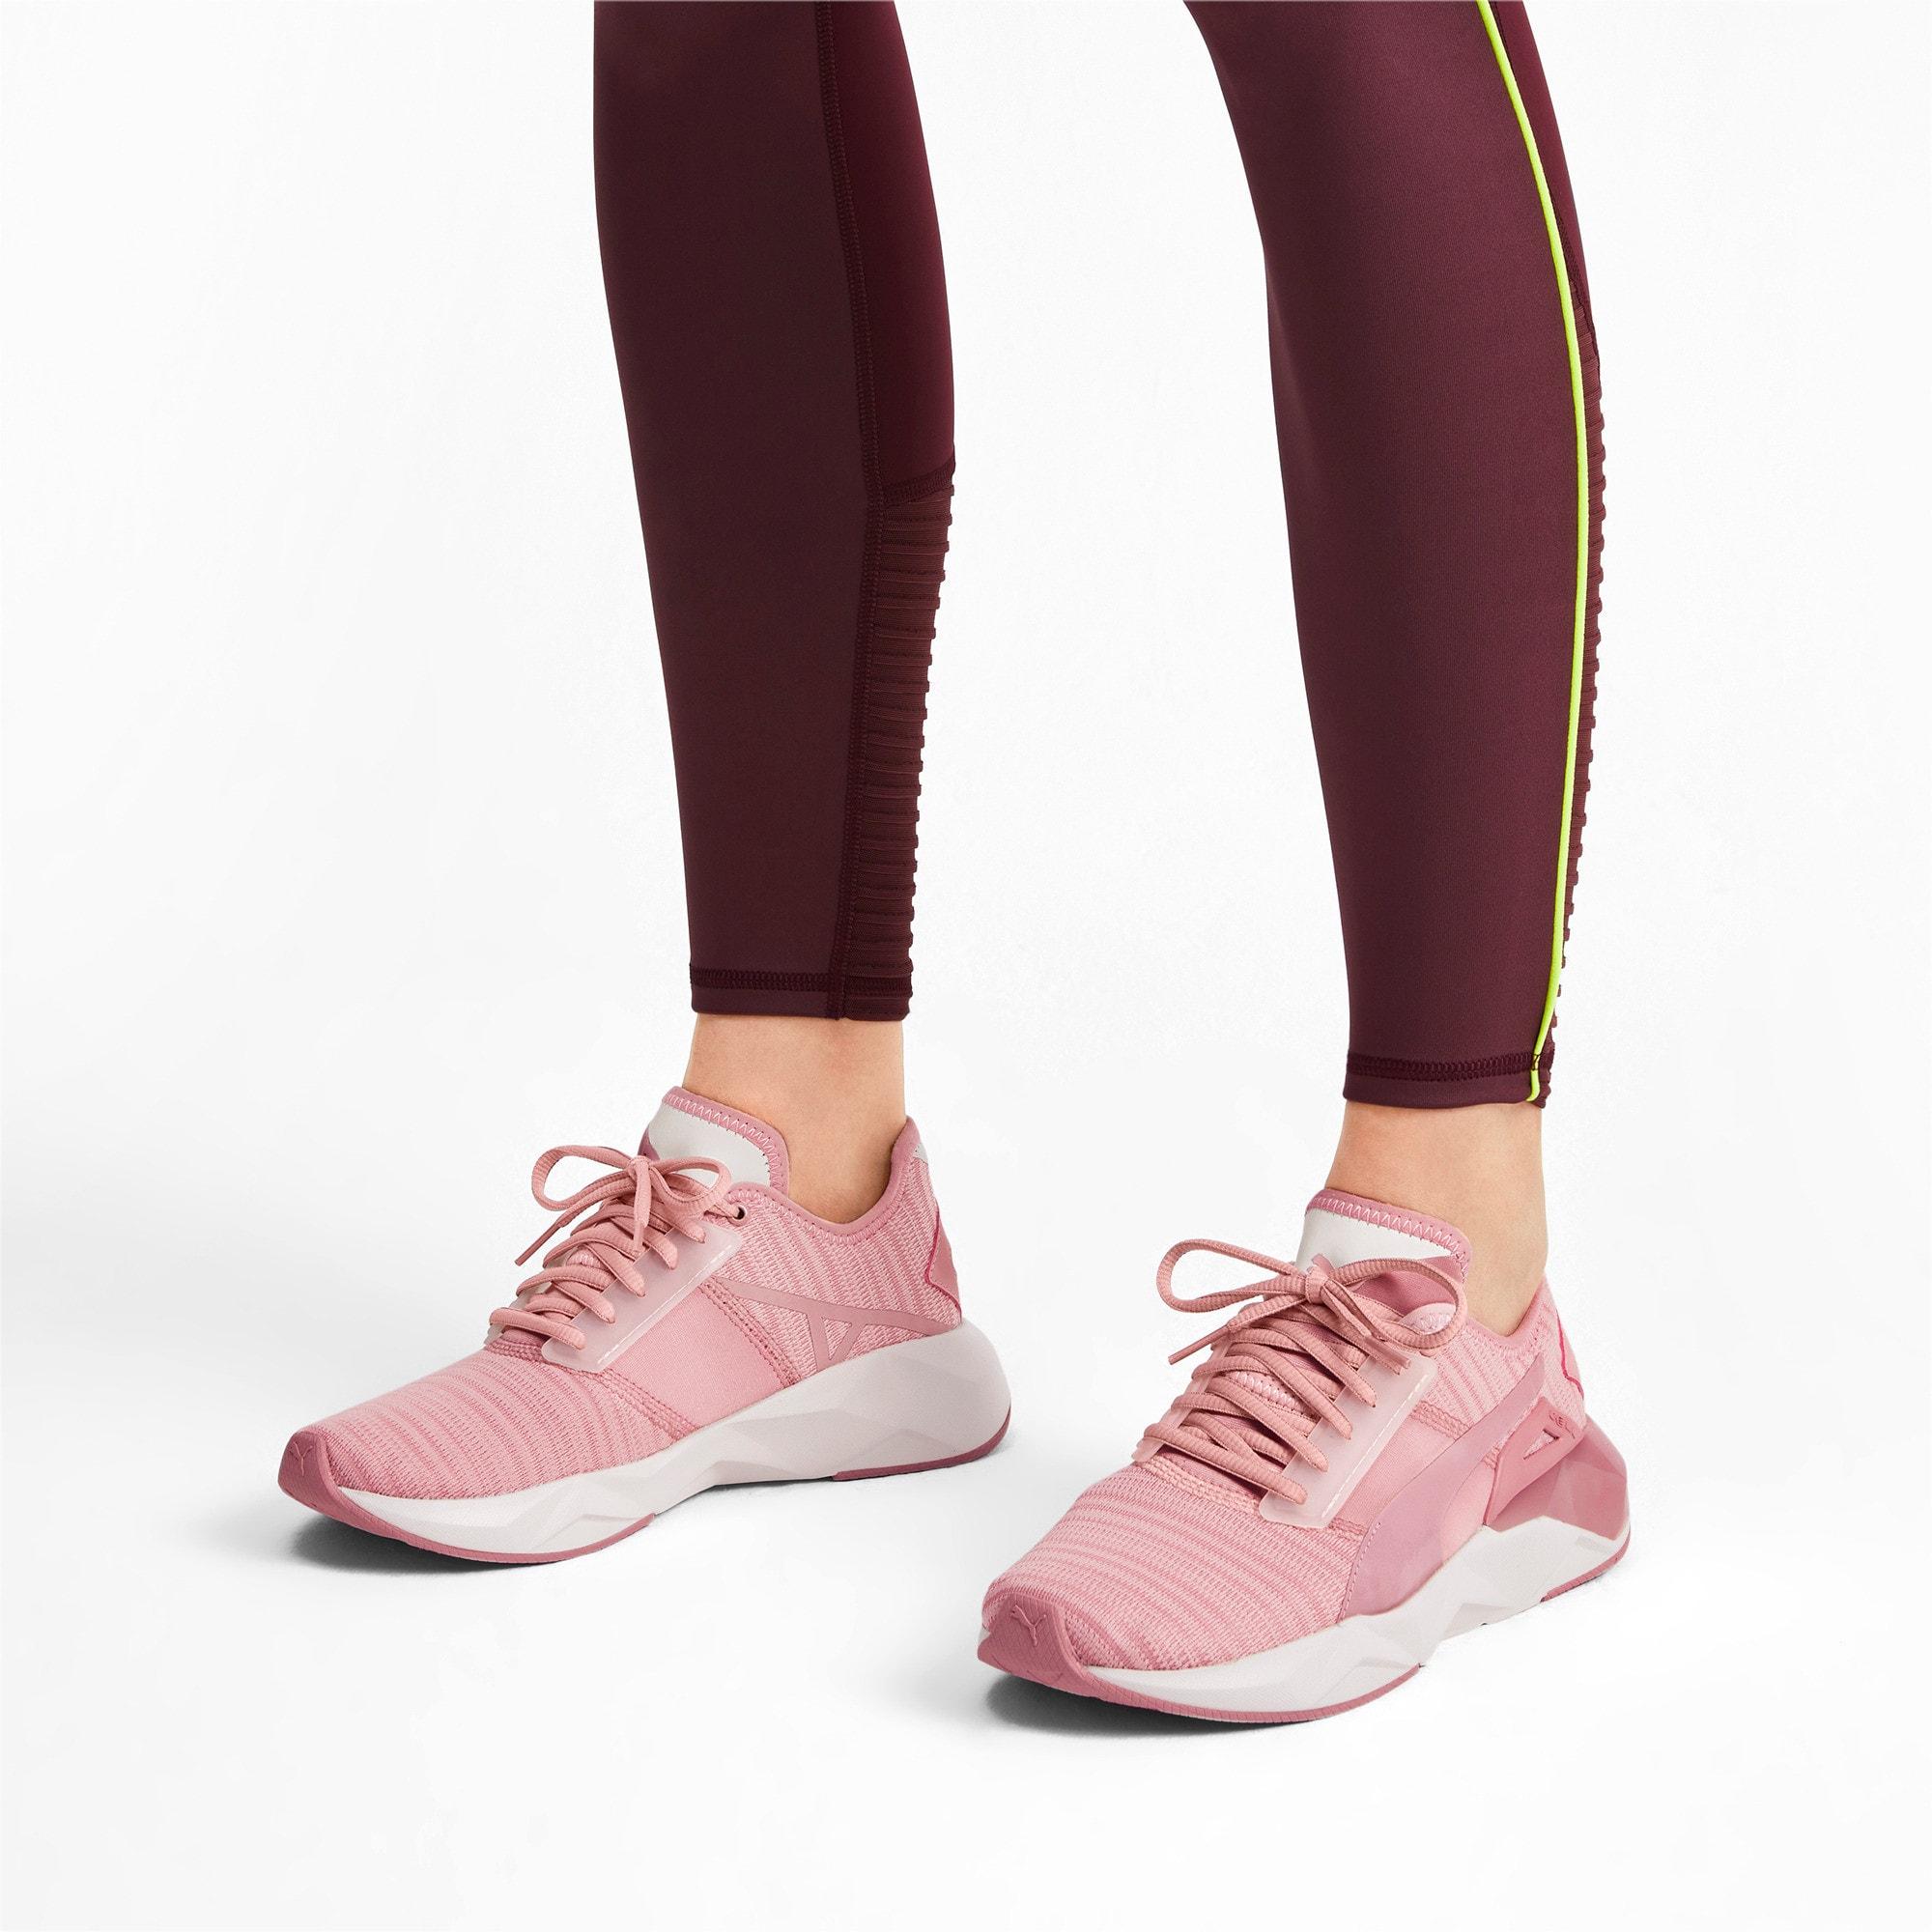 Thumbnail 2 of CELL Plasmic Women's Training Shoes, Bridal Rose-Pastel Parchment, medium